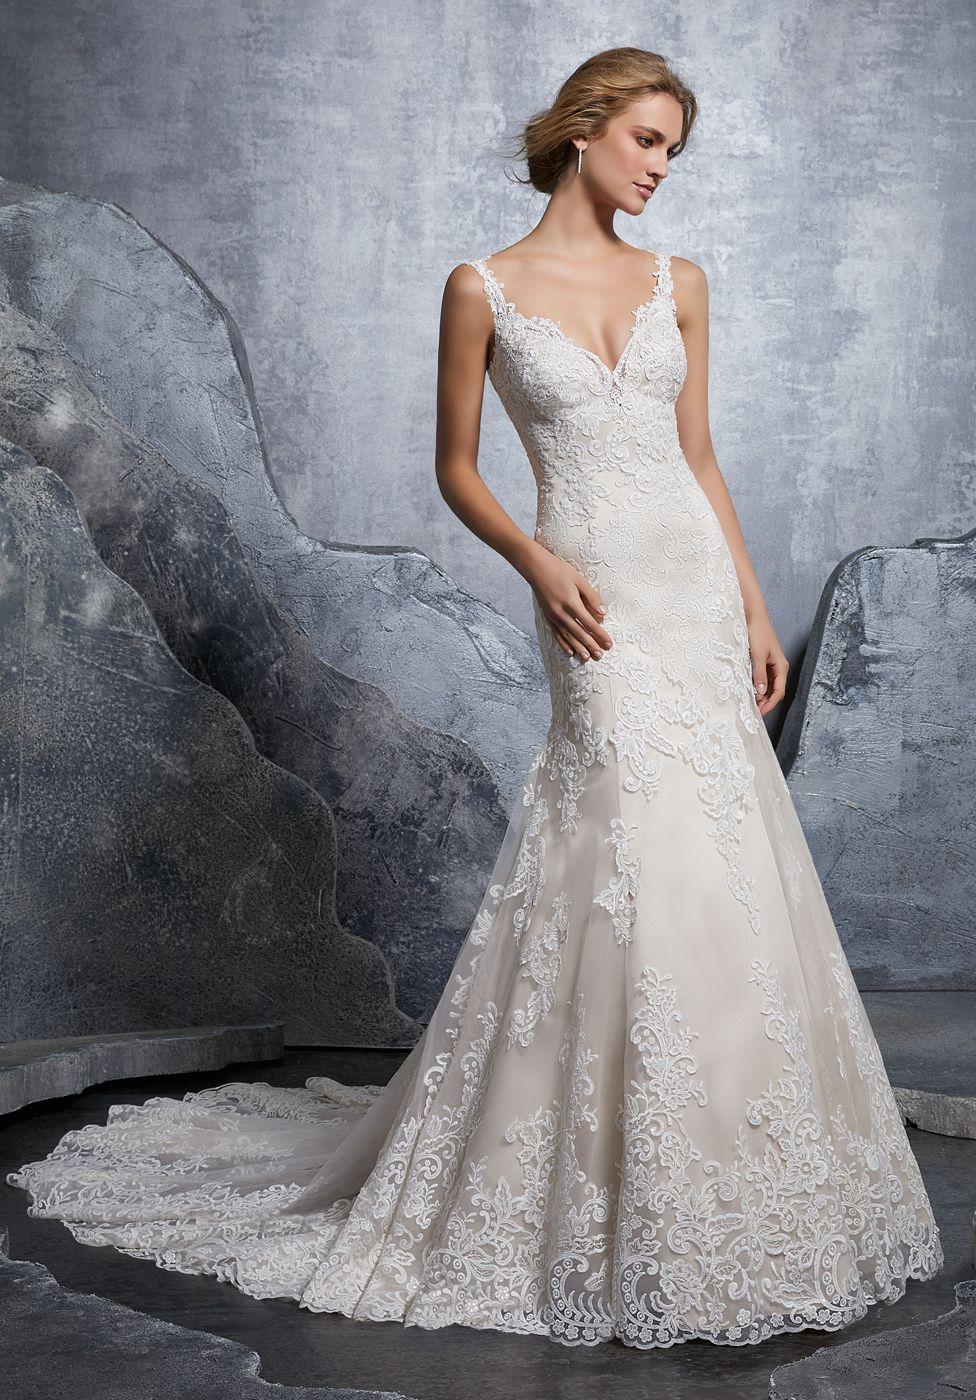 This Mori Lee Bridal 8218 Krystal Fit And Flare Wedding Dress Hangs On Slim Shoulder St Mori Lee Wedding Dress Wedding Dress Styles Fit And Flare Wedding Dress